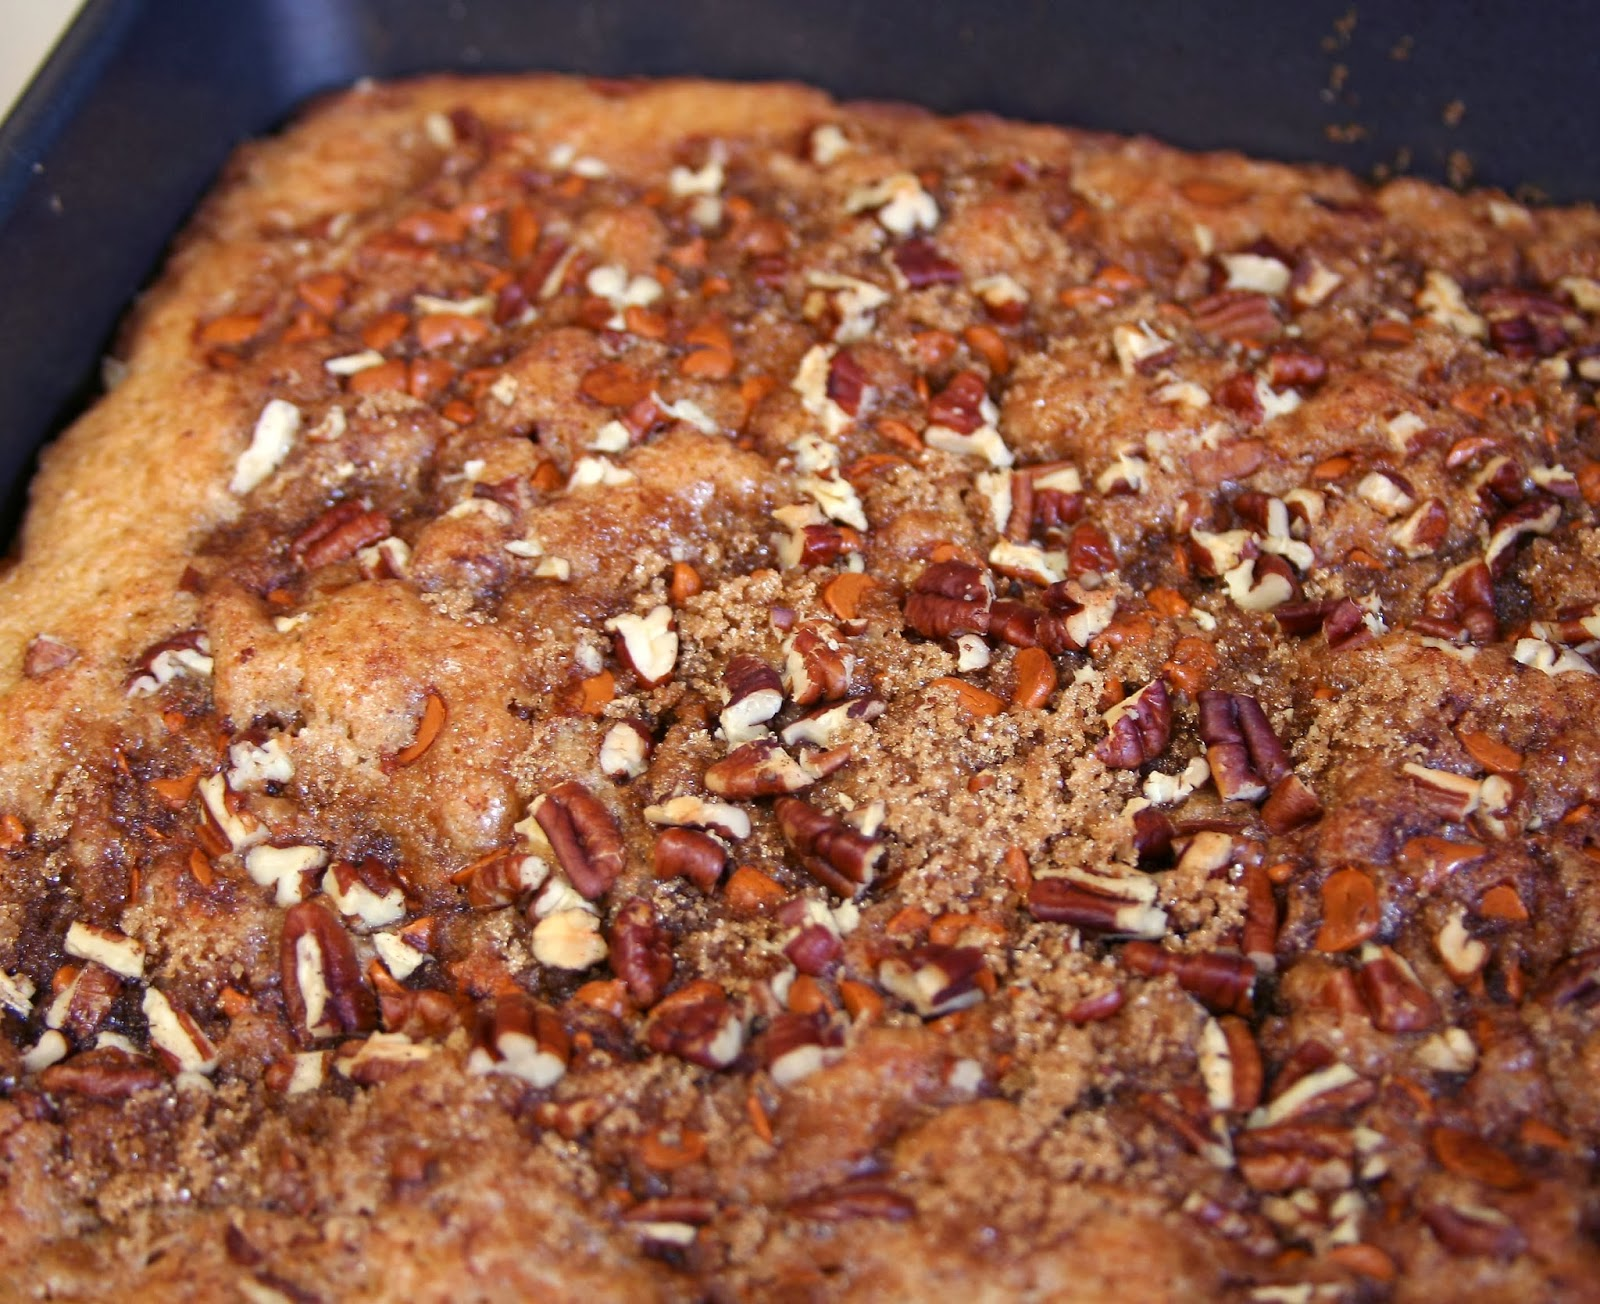 Coffee Cake Recipe King Arthur: Culturally Confused: King Arthur Flour: Overnight Coffee Cake